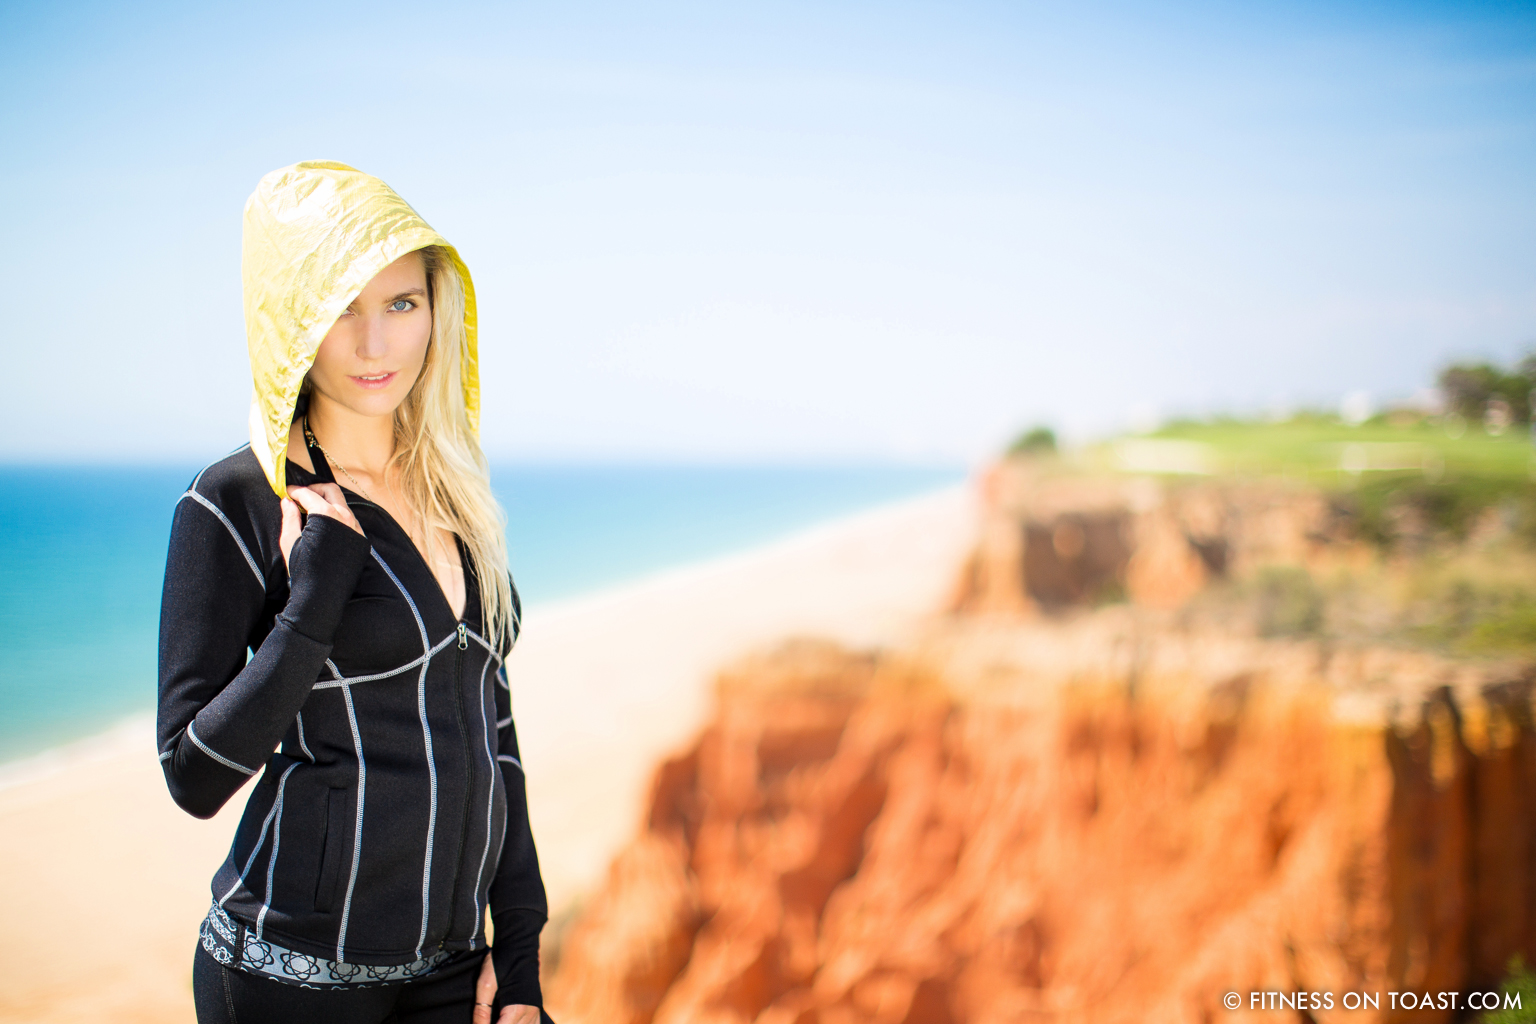 Portugal Algarve Zaggora Running Sports Fitness Girl Faya Fitness On Toast Run Val De Lobo Royal Golf Course Blog-2